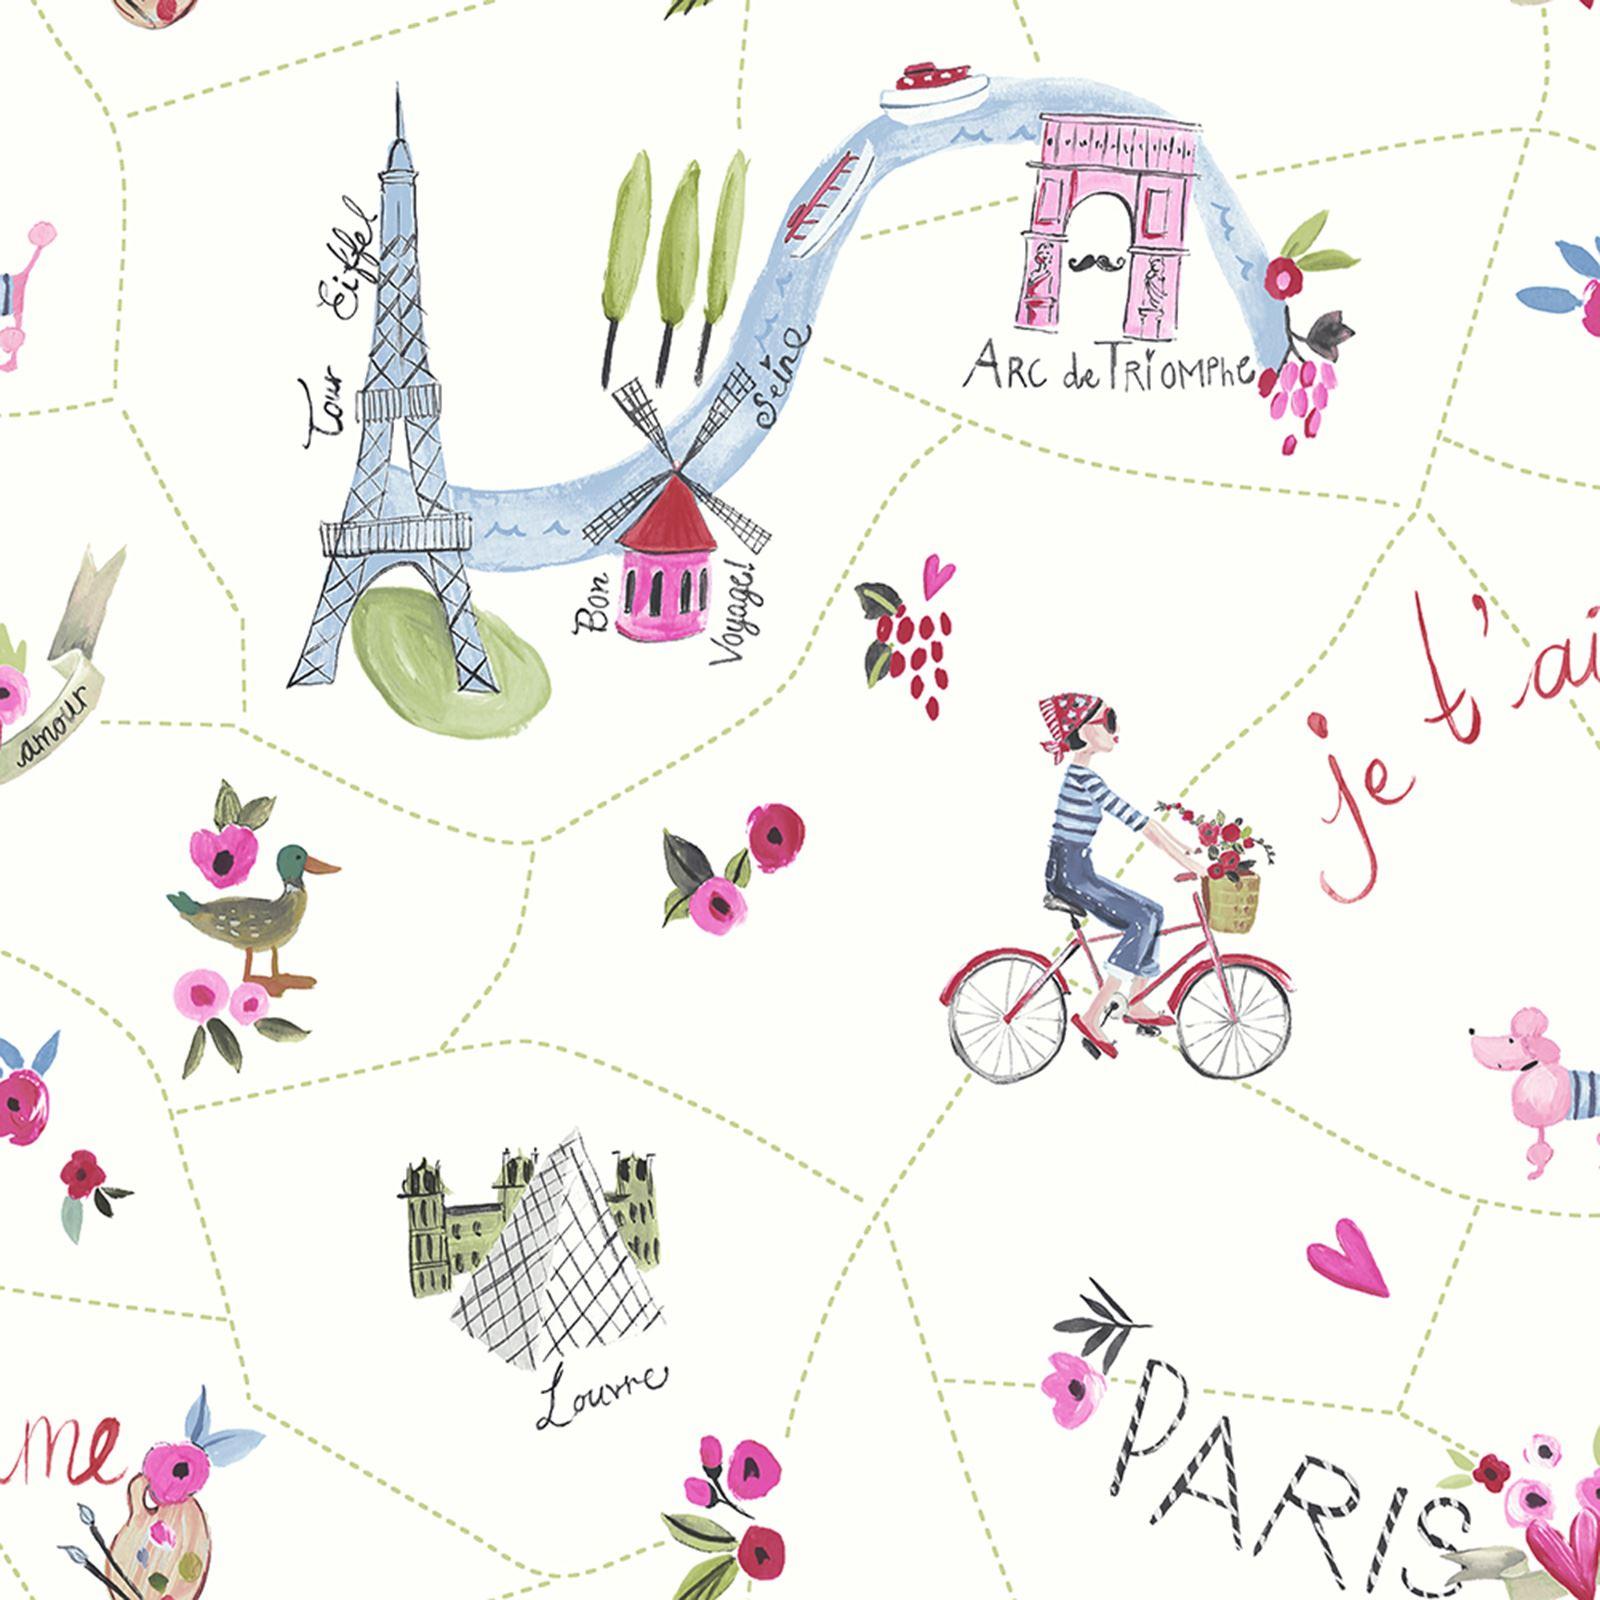 Cool Wallpaper Hello Kitty Paris - 377f88df-227b-4174-b7b0-b7d17aa33ebb  Image_425452.jpg